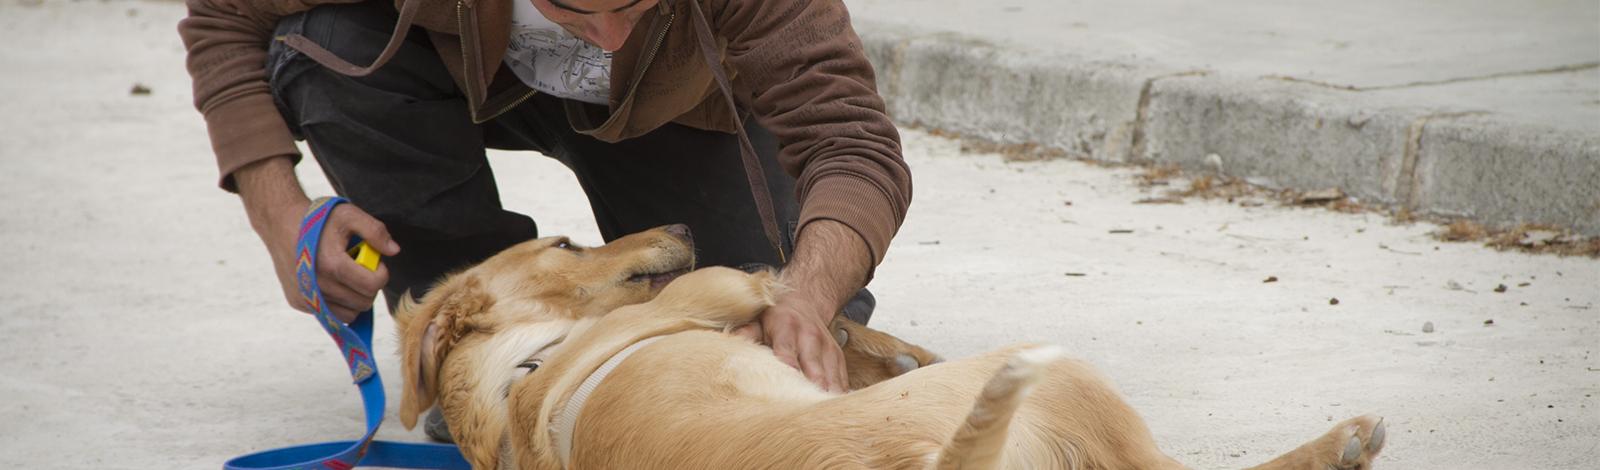 Terapia_asistida_con_animales_0026_humanymal